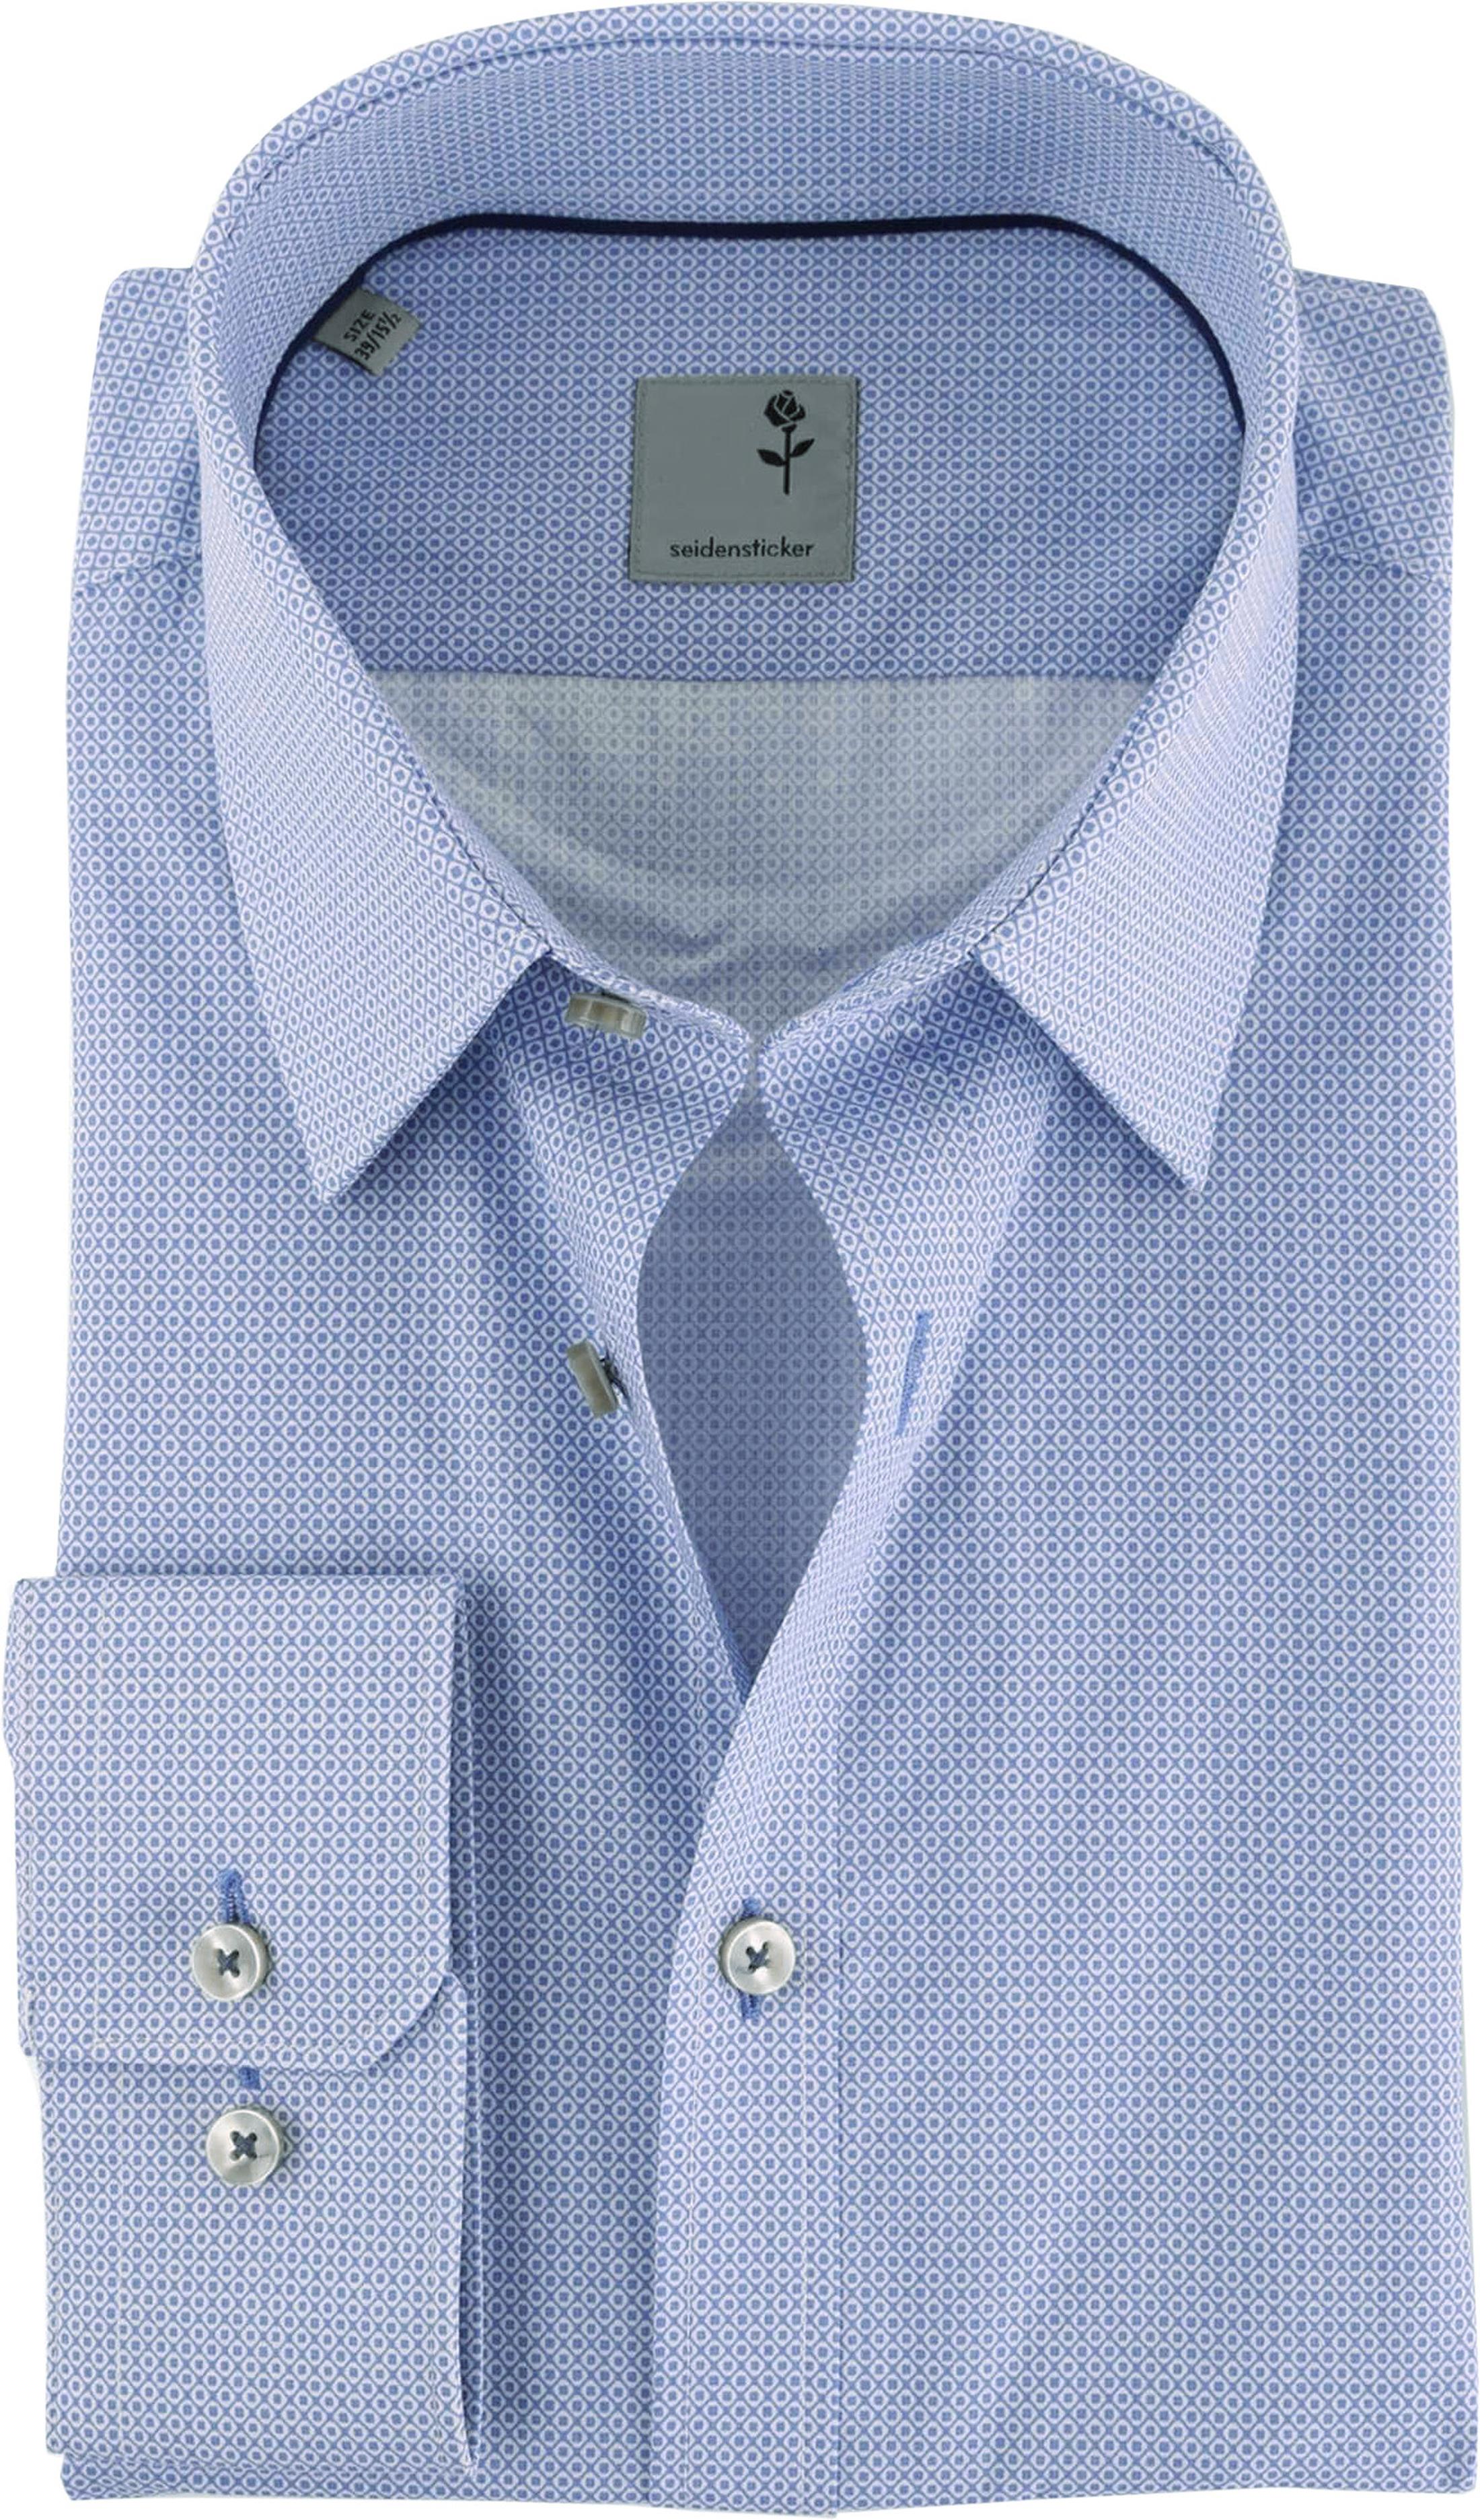 Seidensticker Slim Fit Shirt Blue Print foto 0